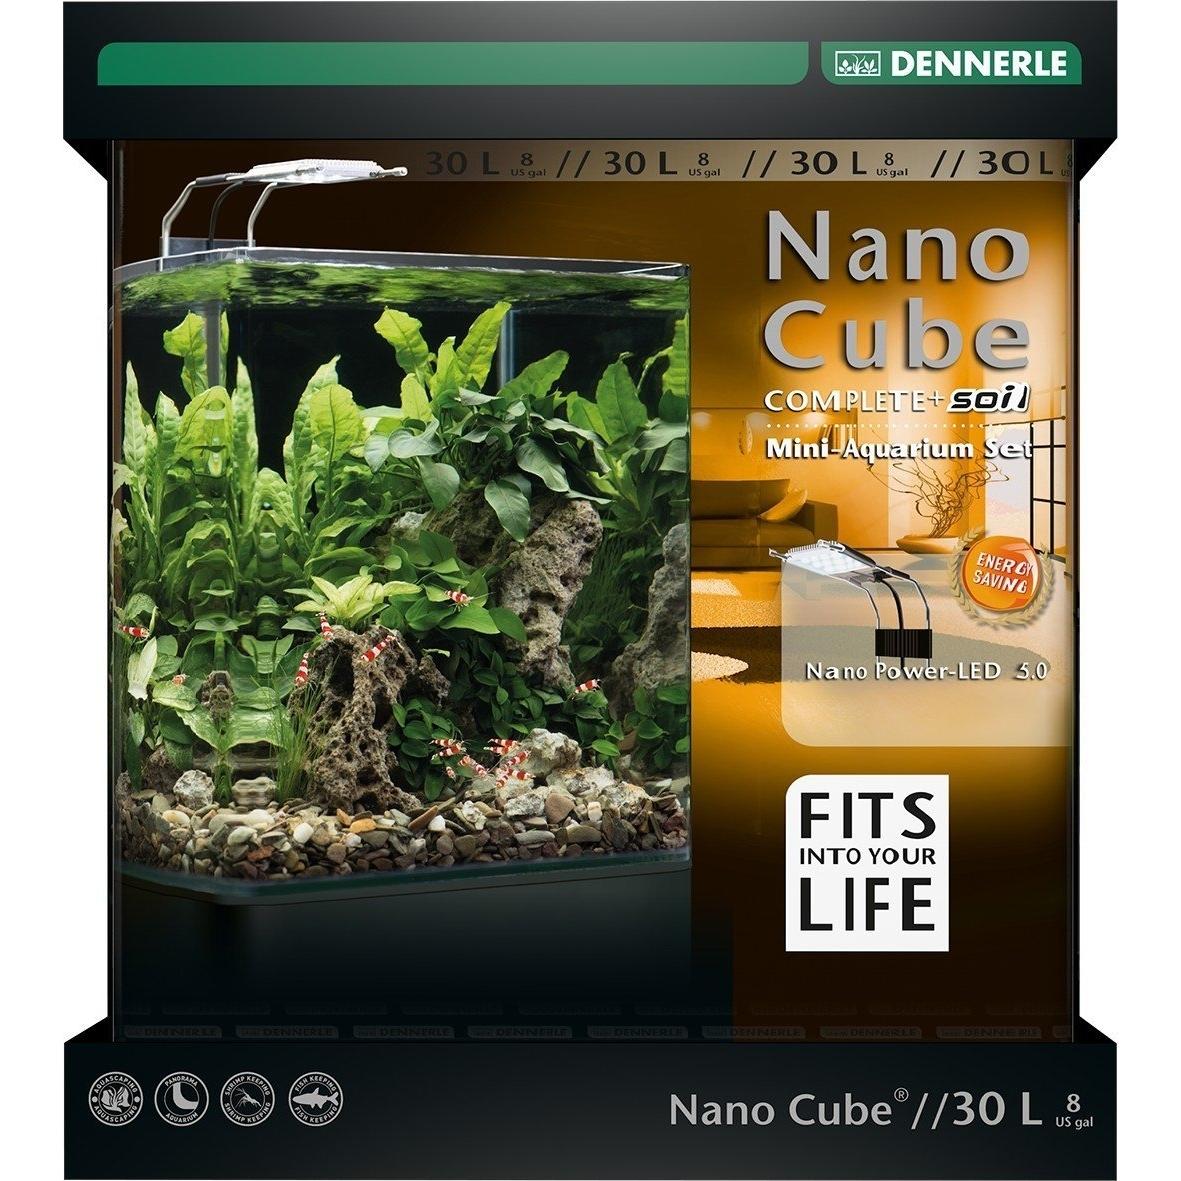 Dennerle NanoCube Complete+ SOIL PowerLED 5.0 Bild 5